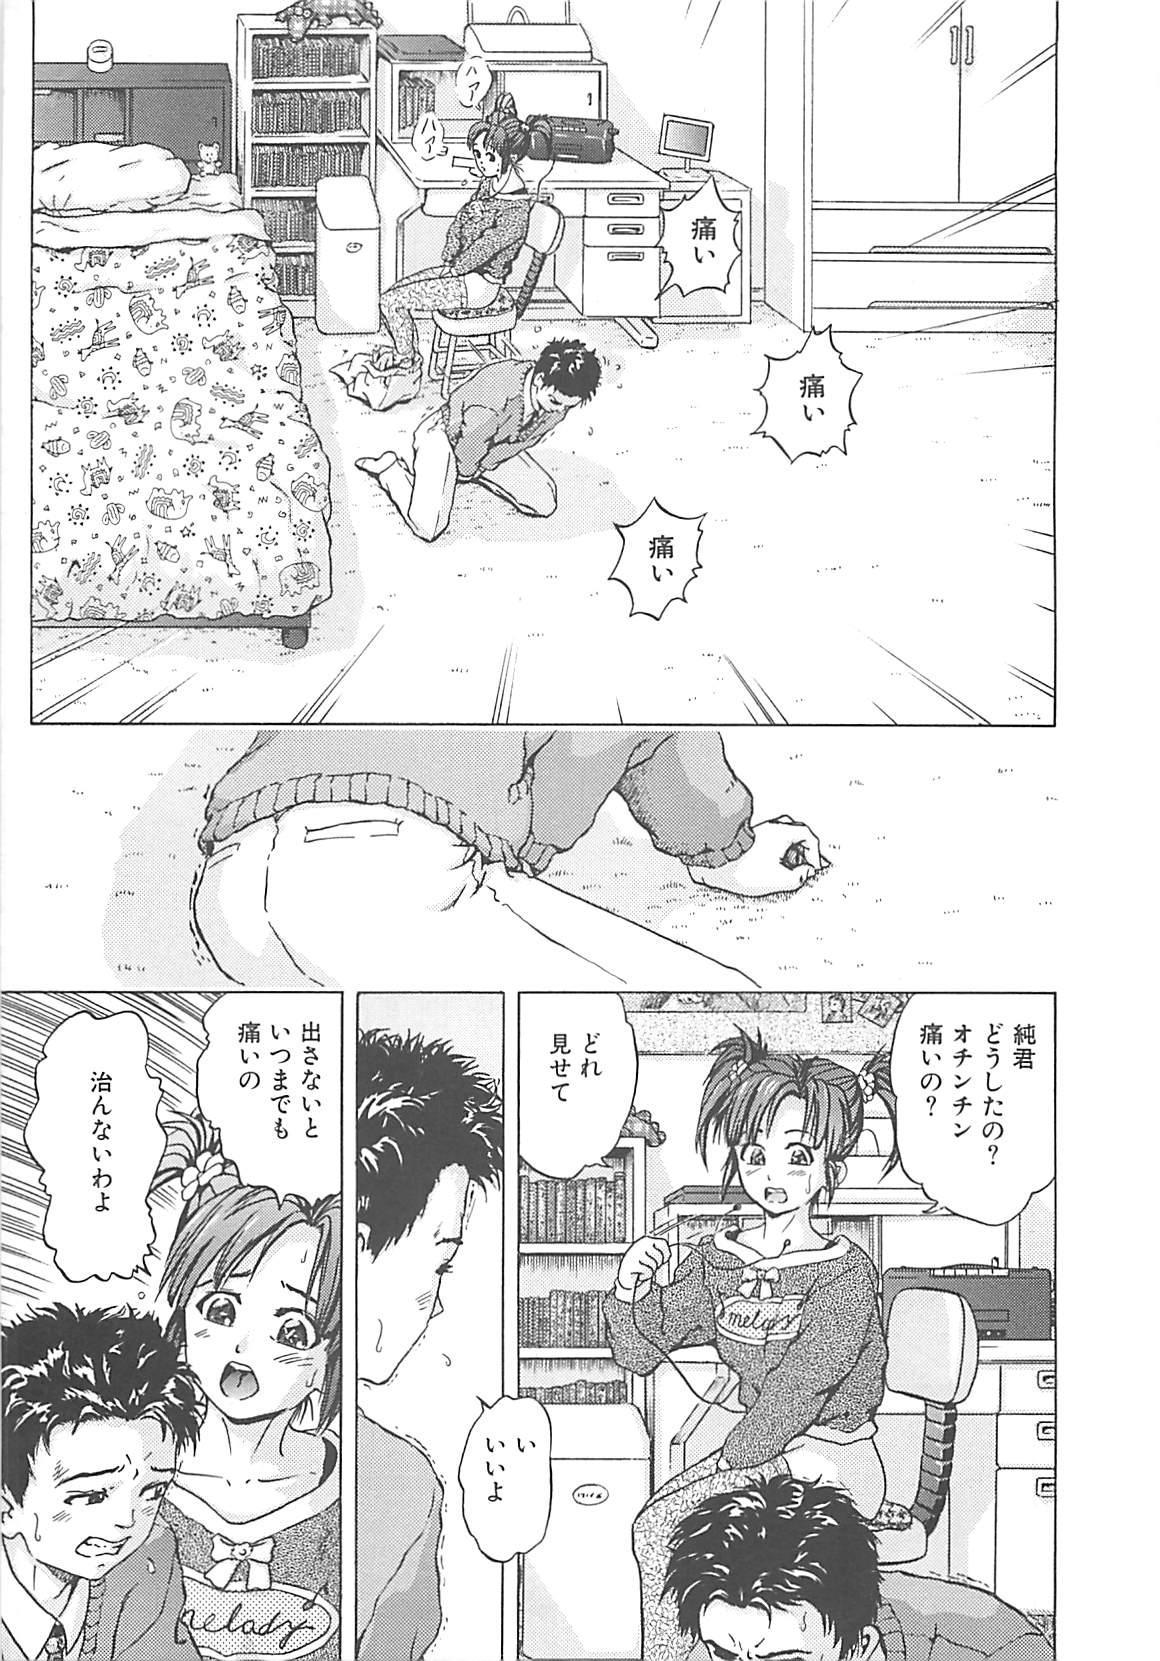 Kanin Kyoushitsu - Adultery Classroom 29